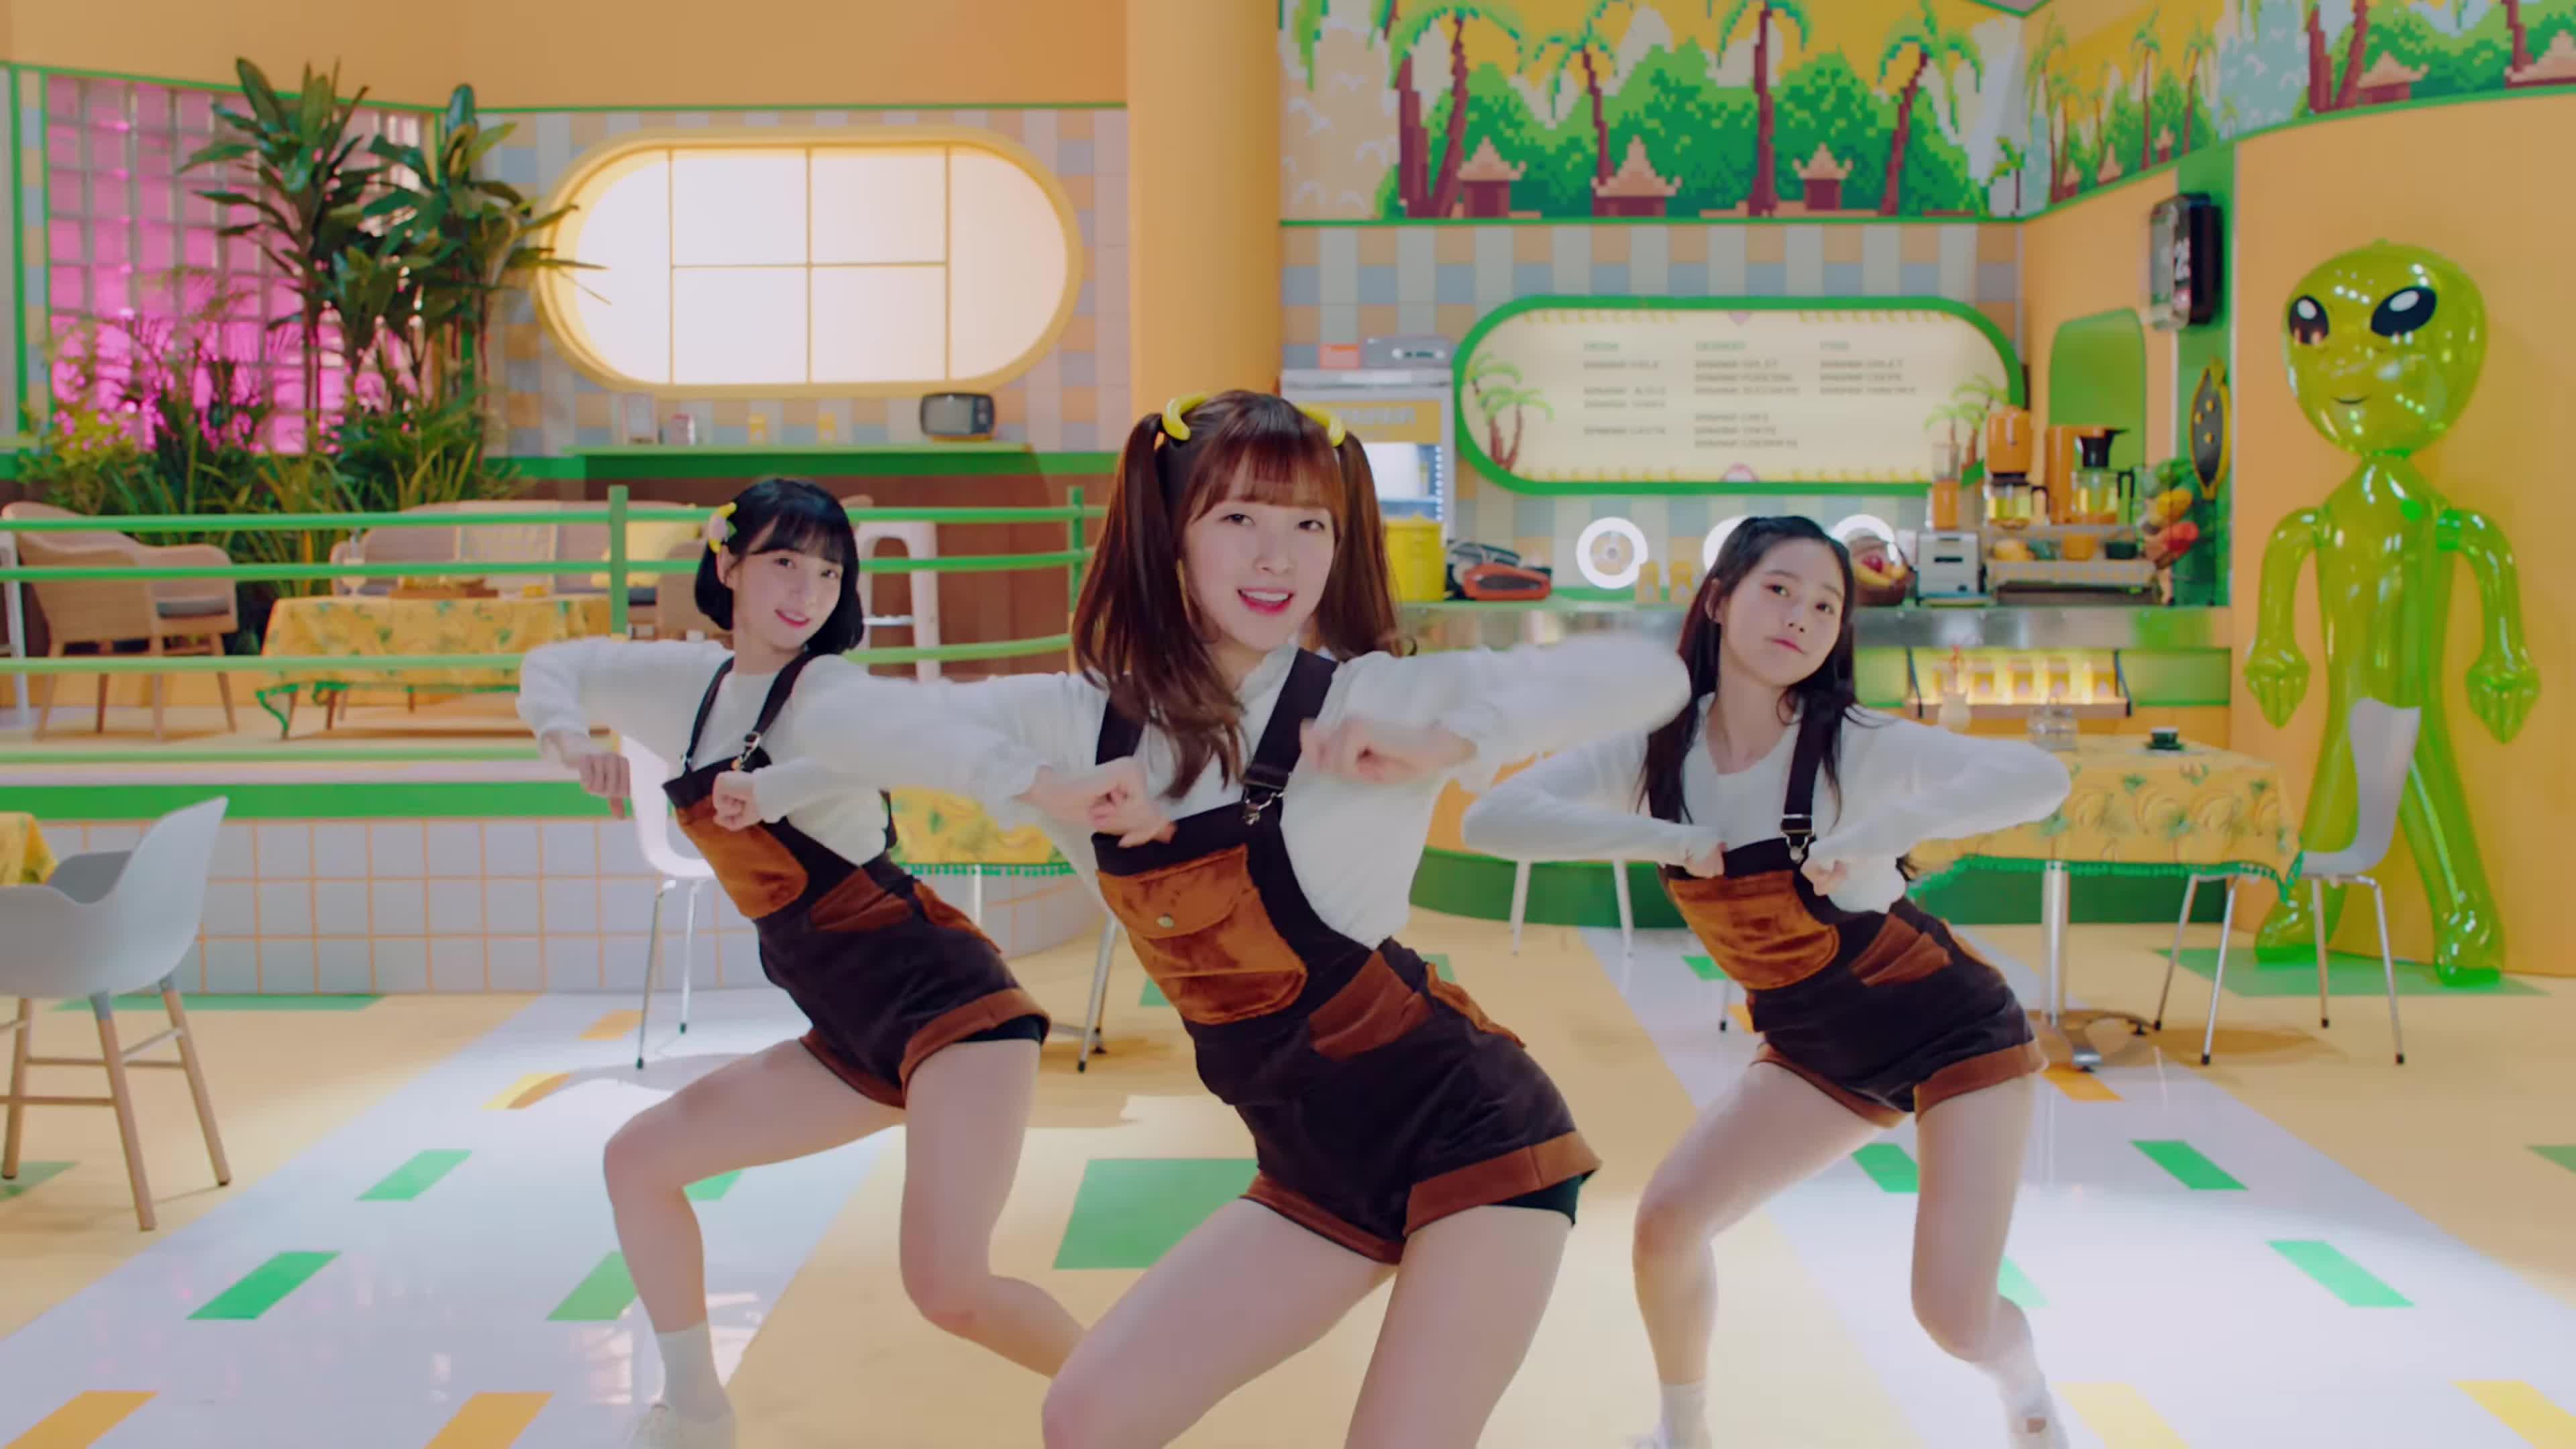 1theK, Kpop, MV, Teaser, loen, 로엔, 뮤비, 신곡, 원더케이, 티져, [MV] OH MY GIRL BANHANA(오마이걸 반하나) _ Banana allergy monkey(바나나 알러지 원숭이) GIFs